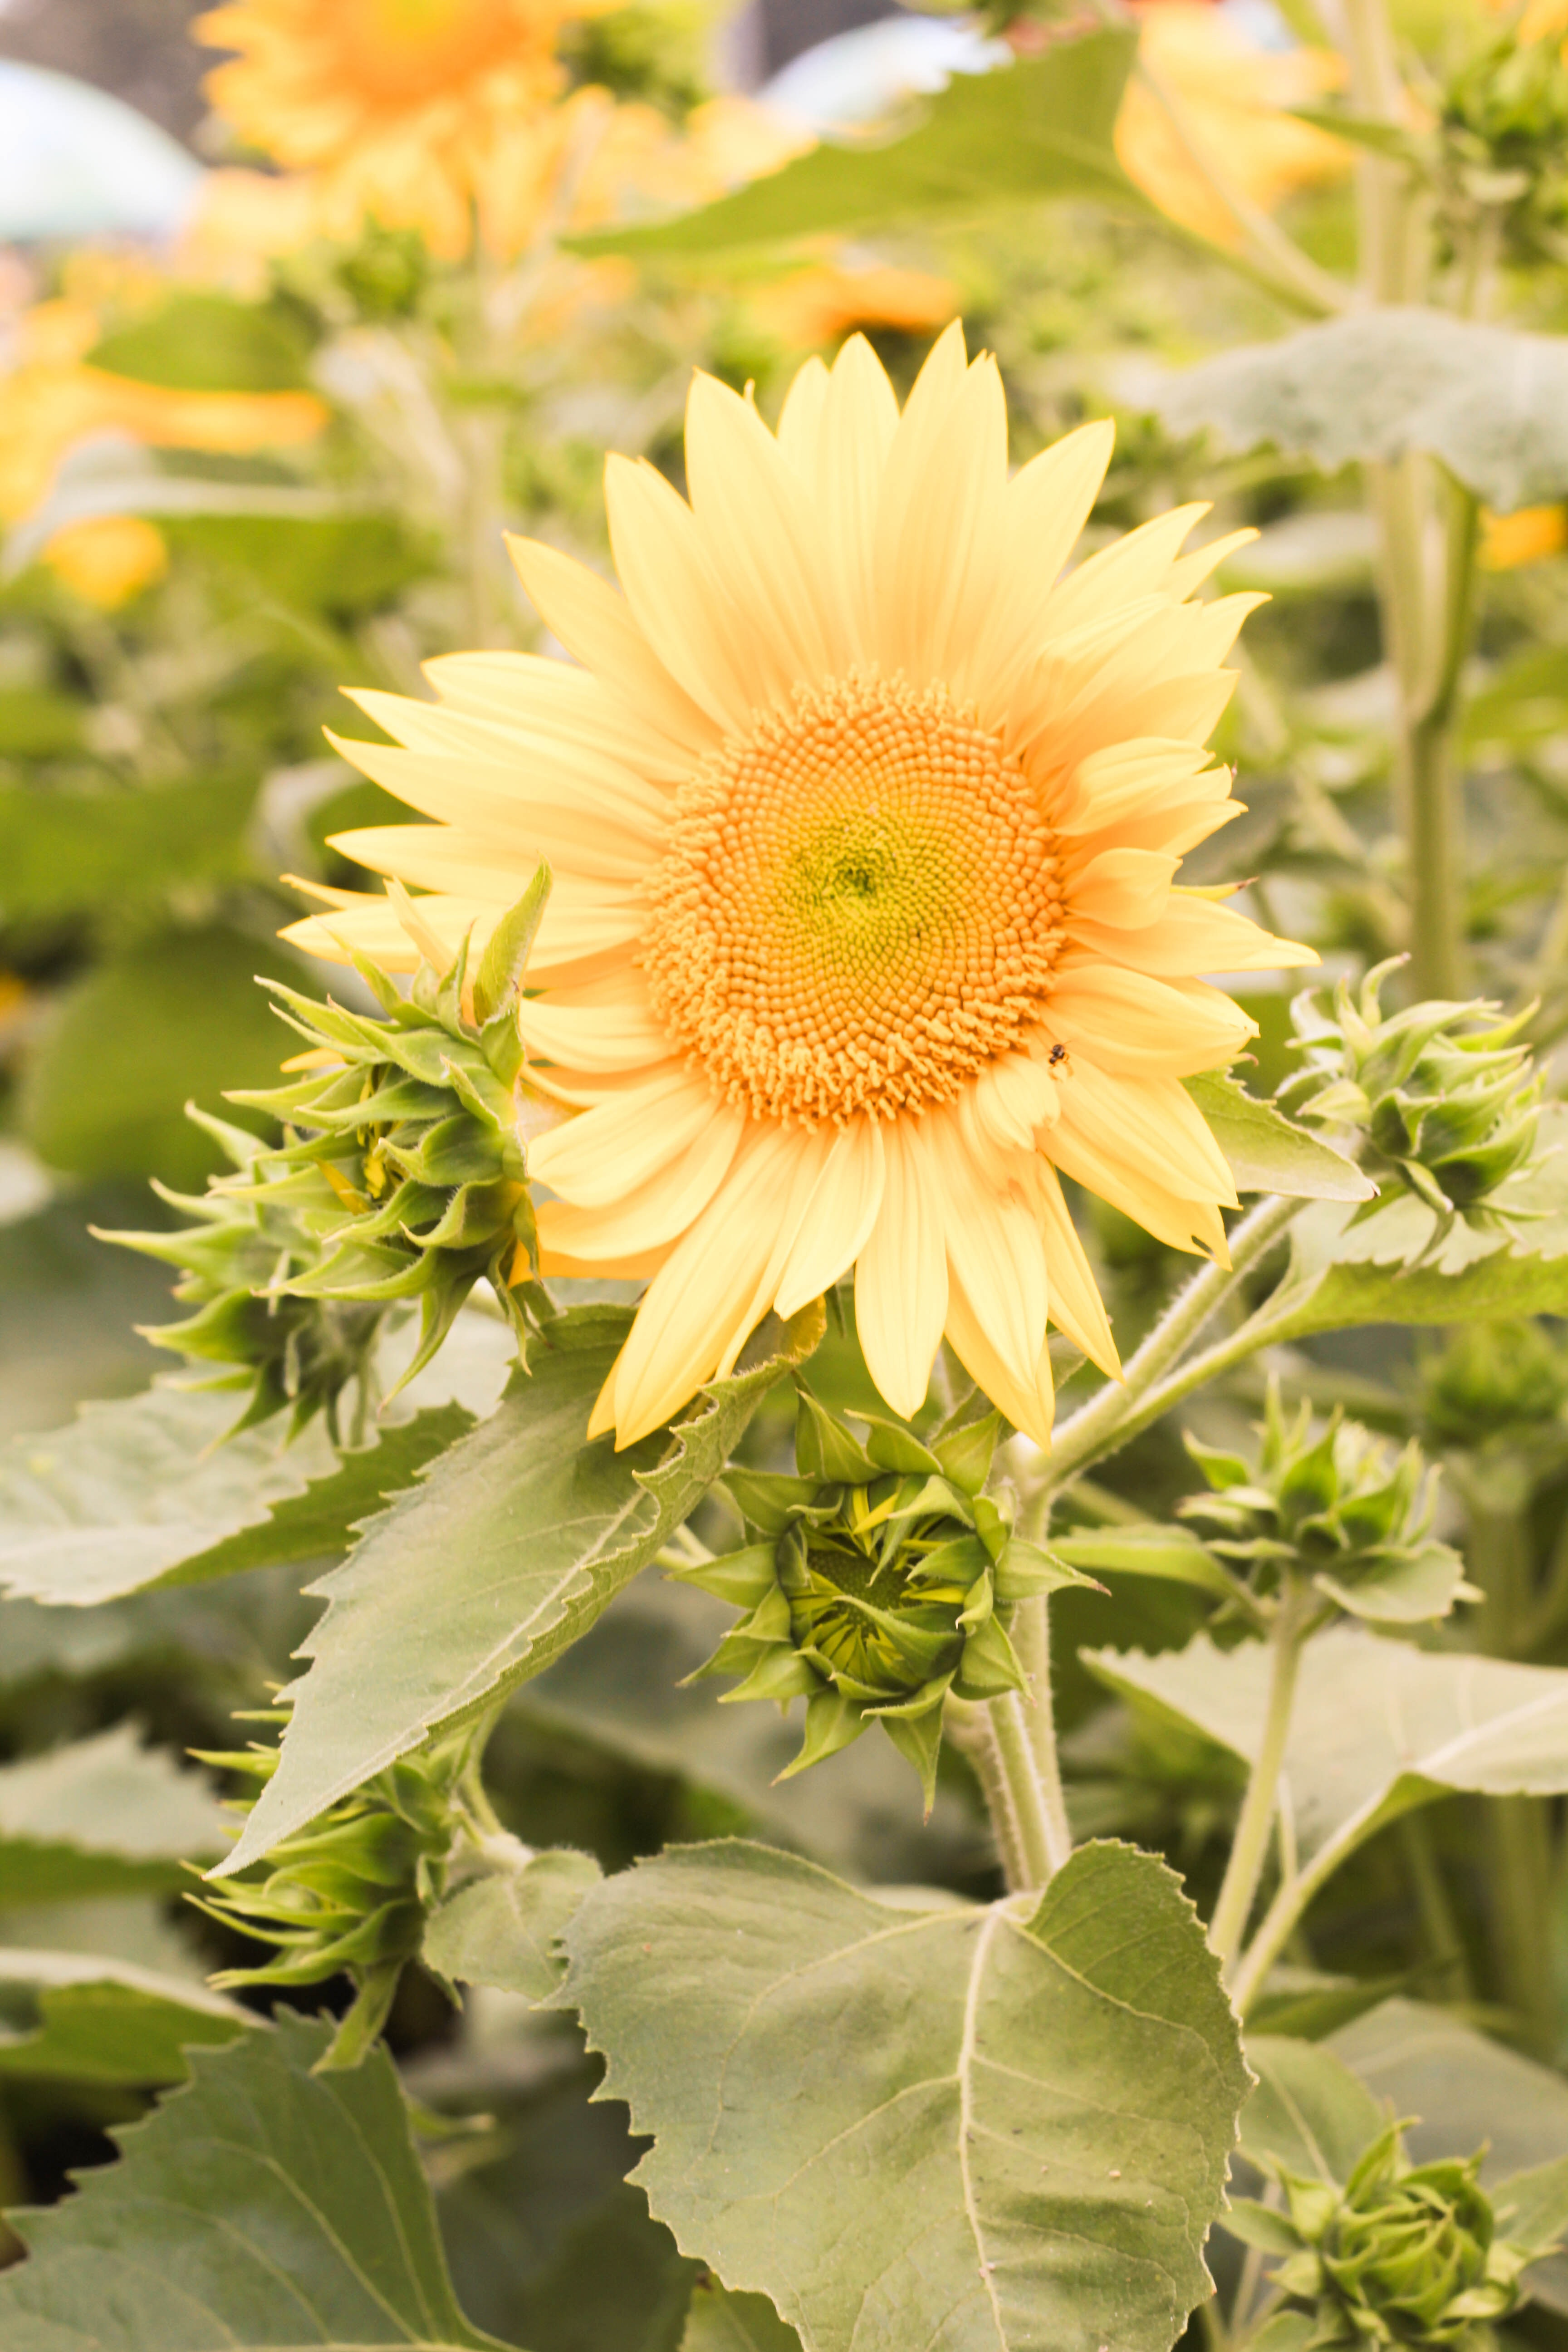 Free stock photo of beautiful flowers beauty flowers free download izmirmasajfo